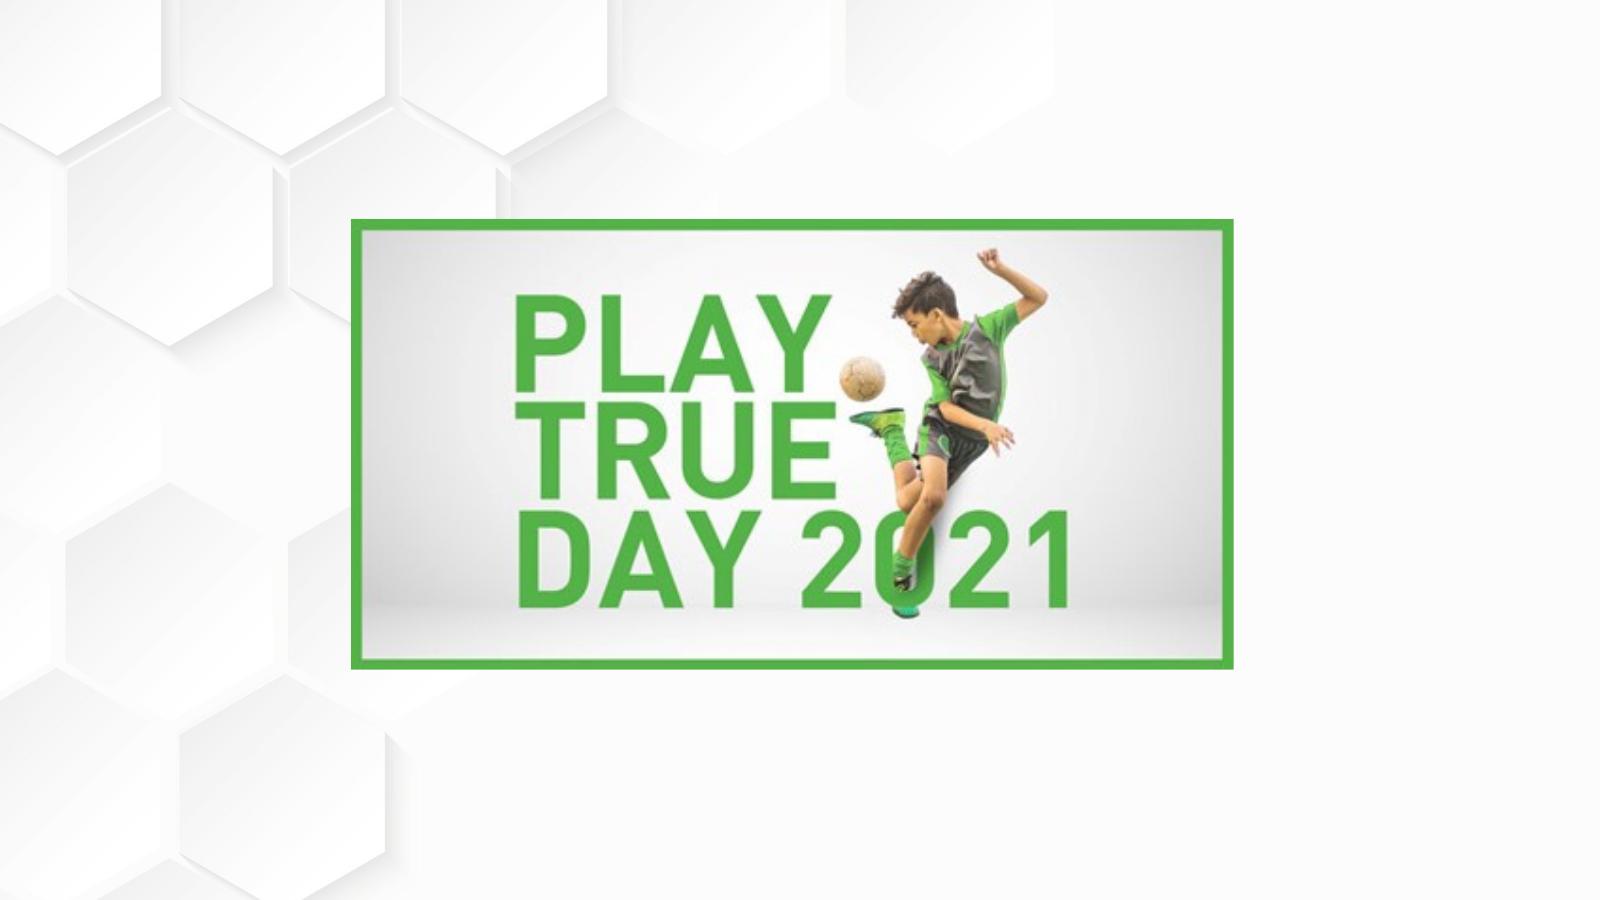 Play True Day